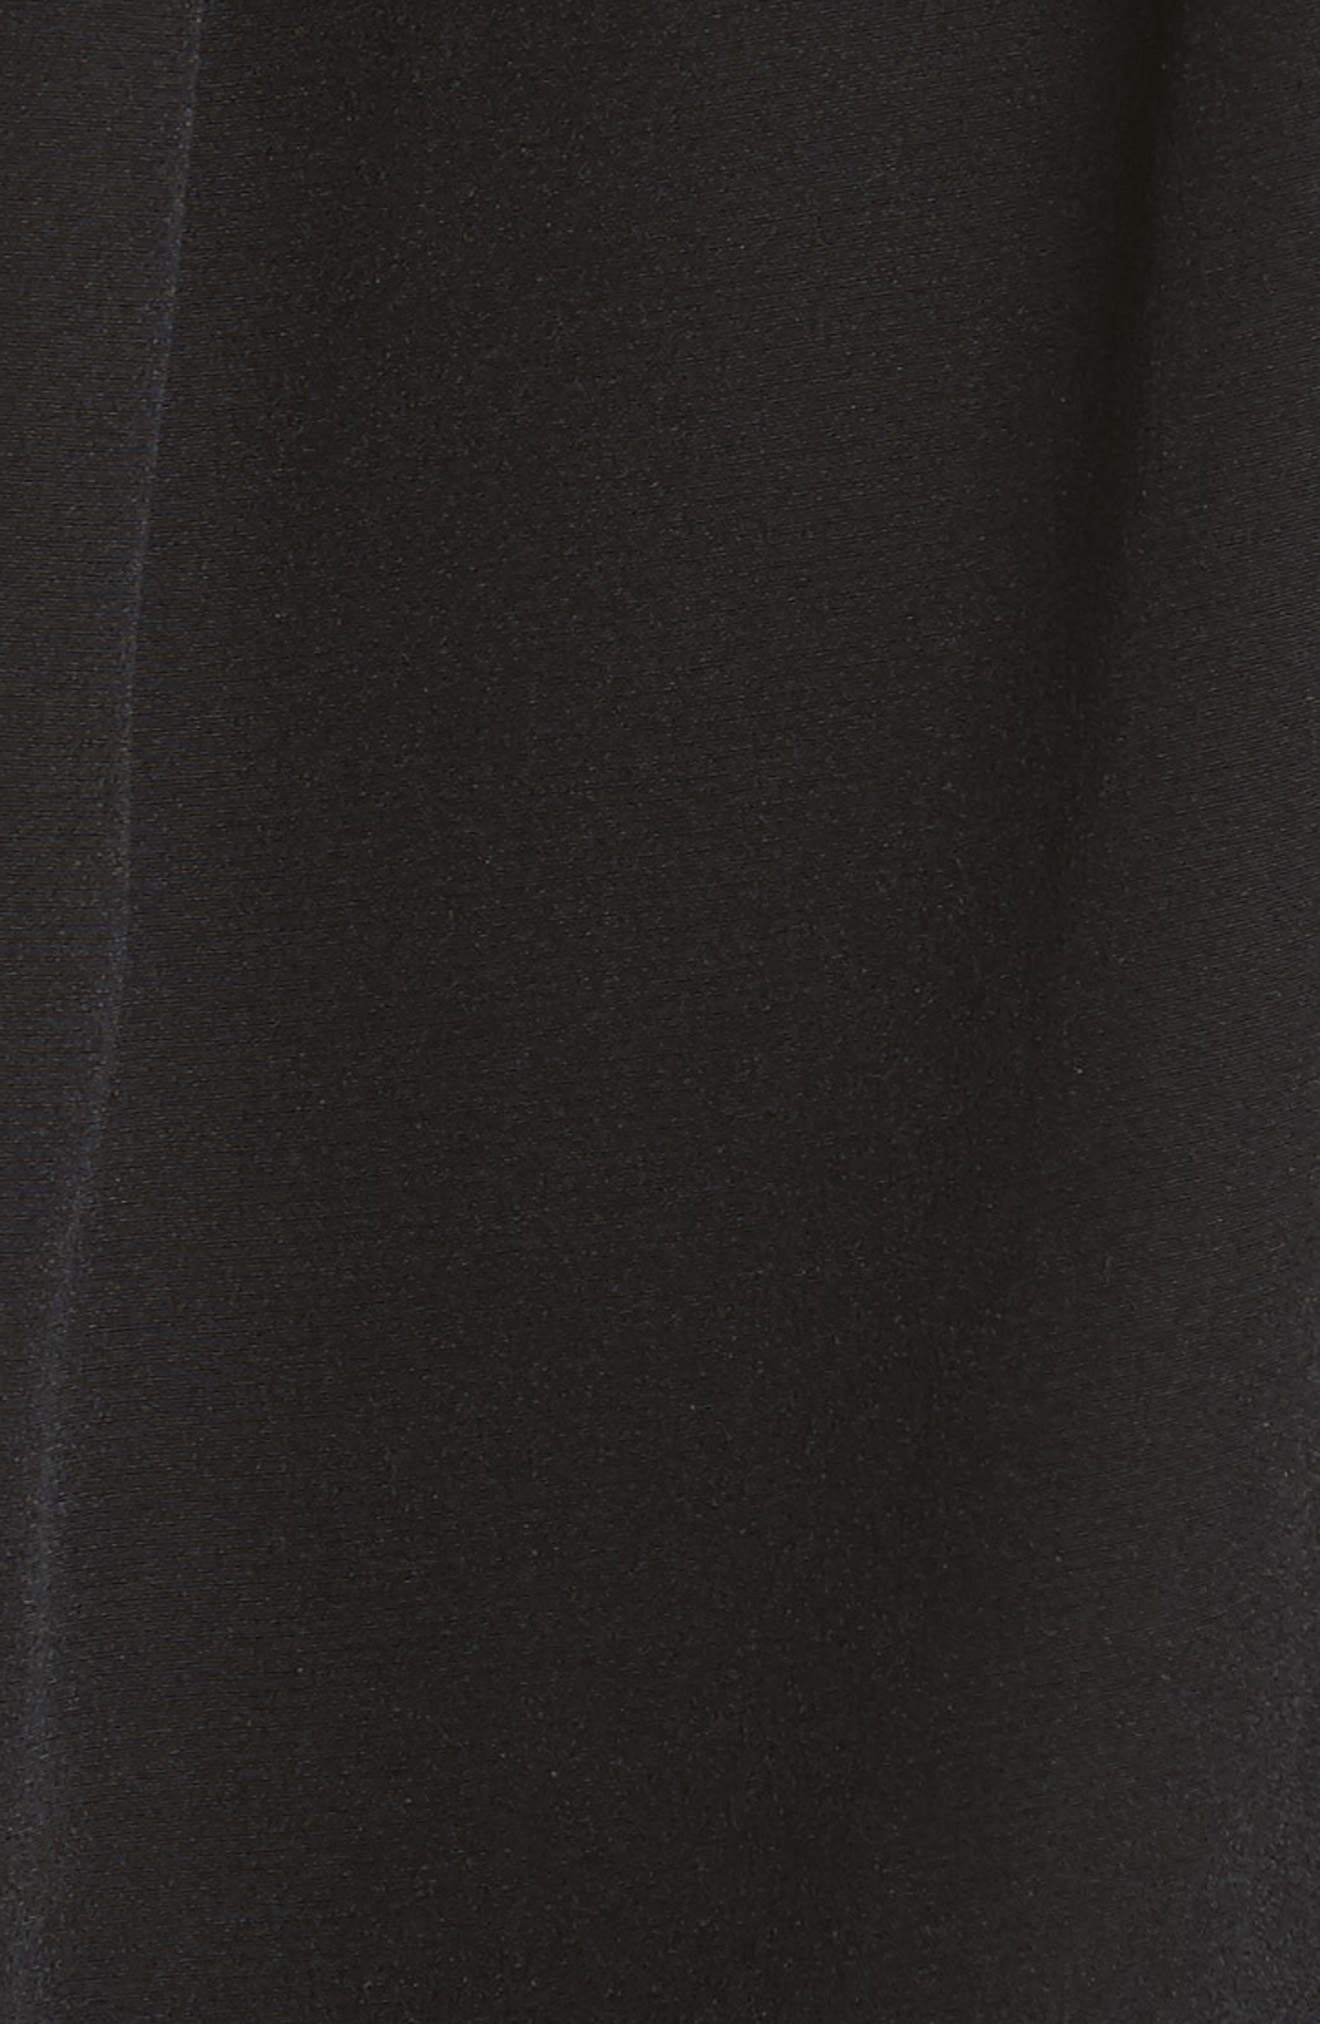 Cutout Silk Top,                             Alternate thumbnail 5, color,                             001